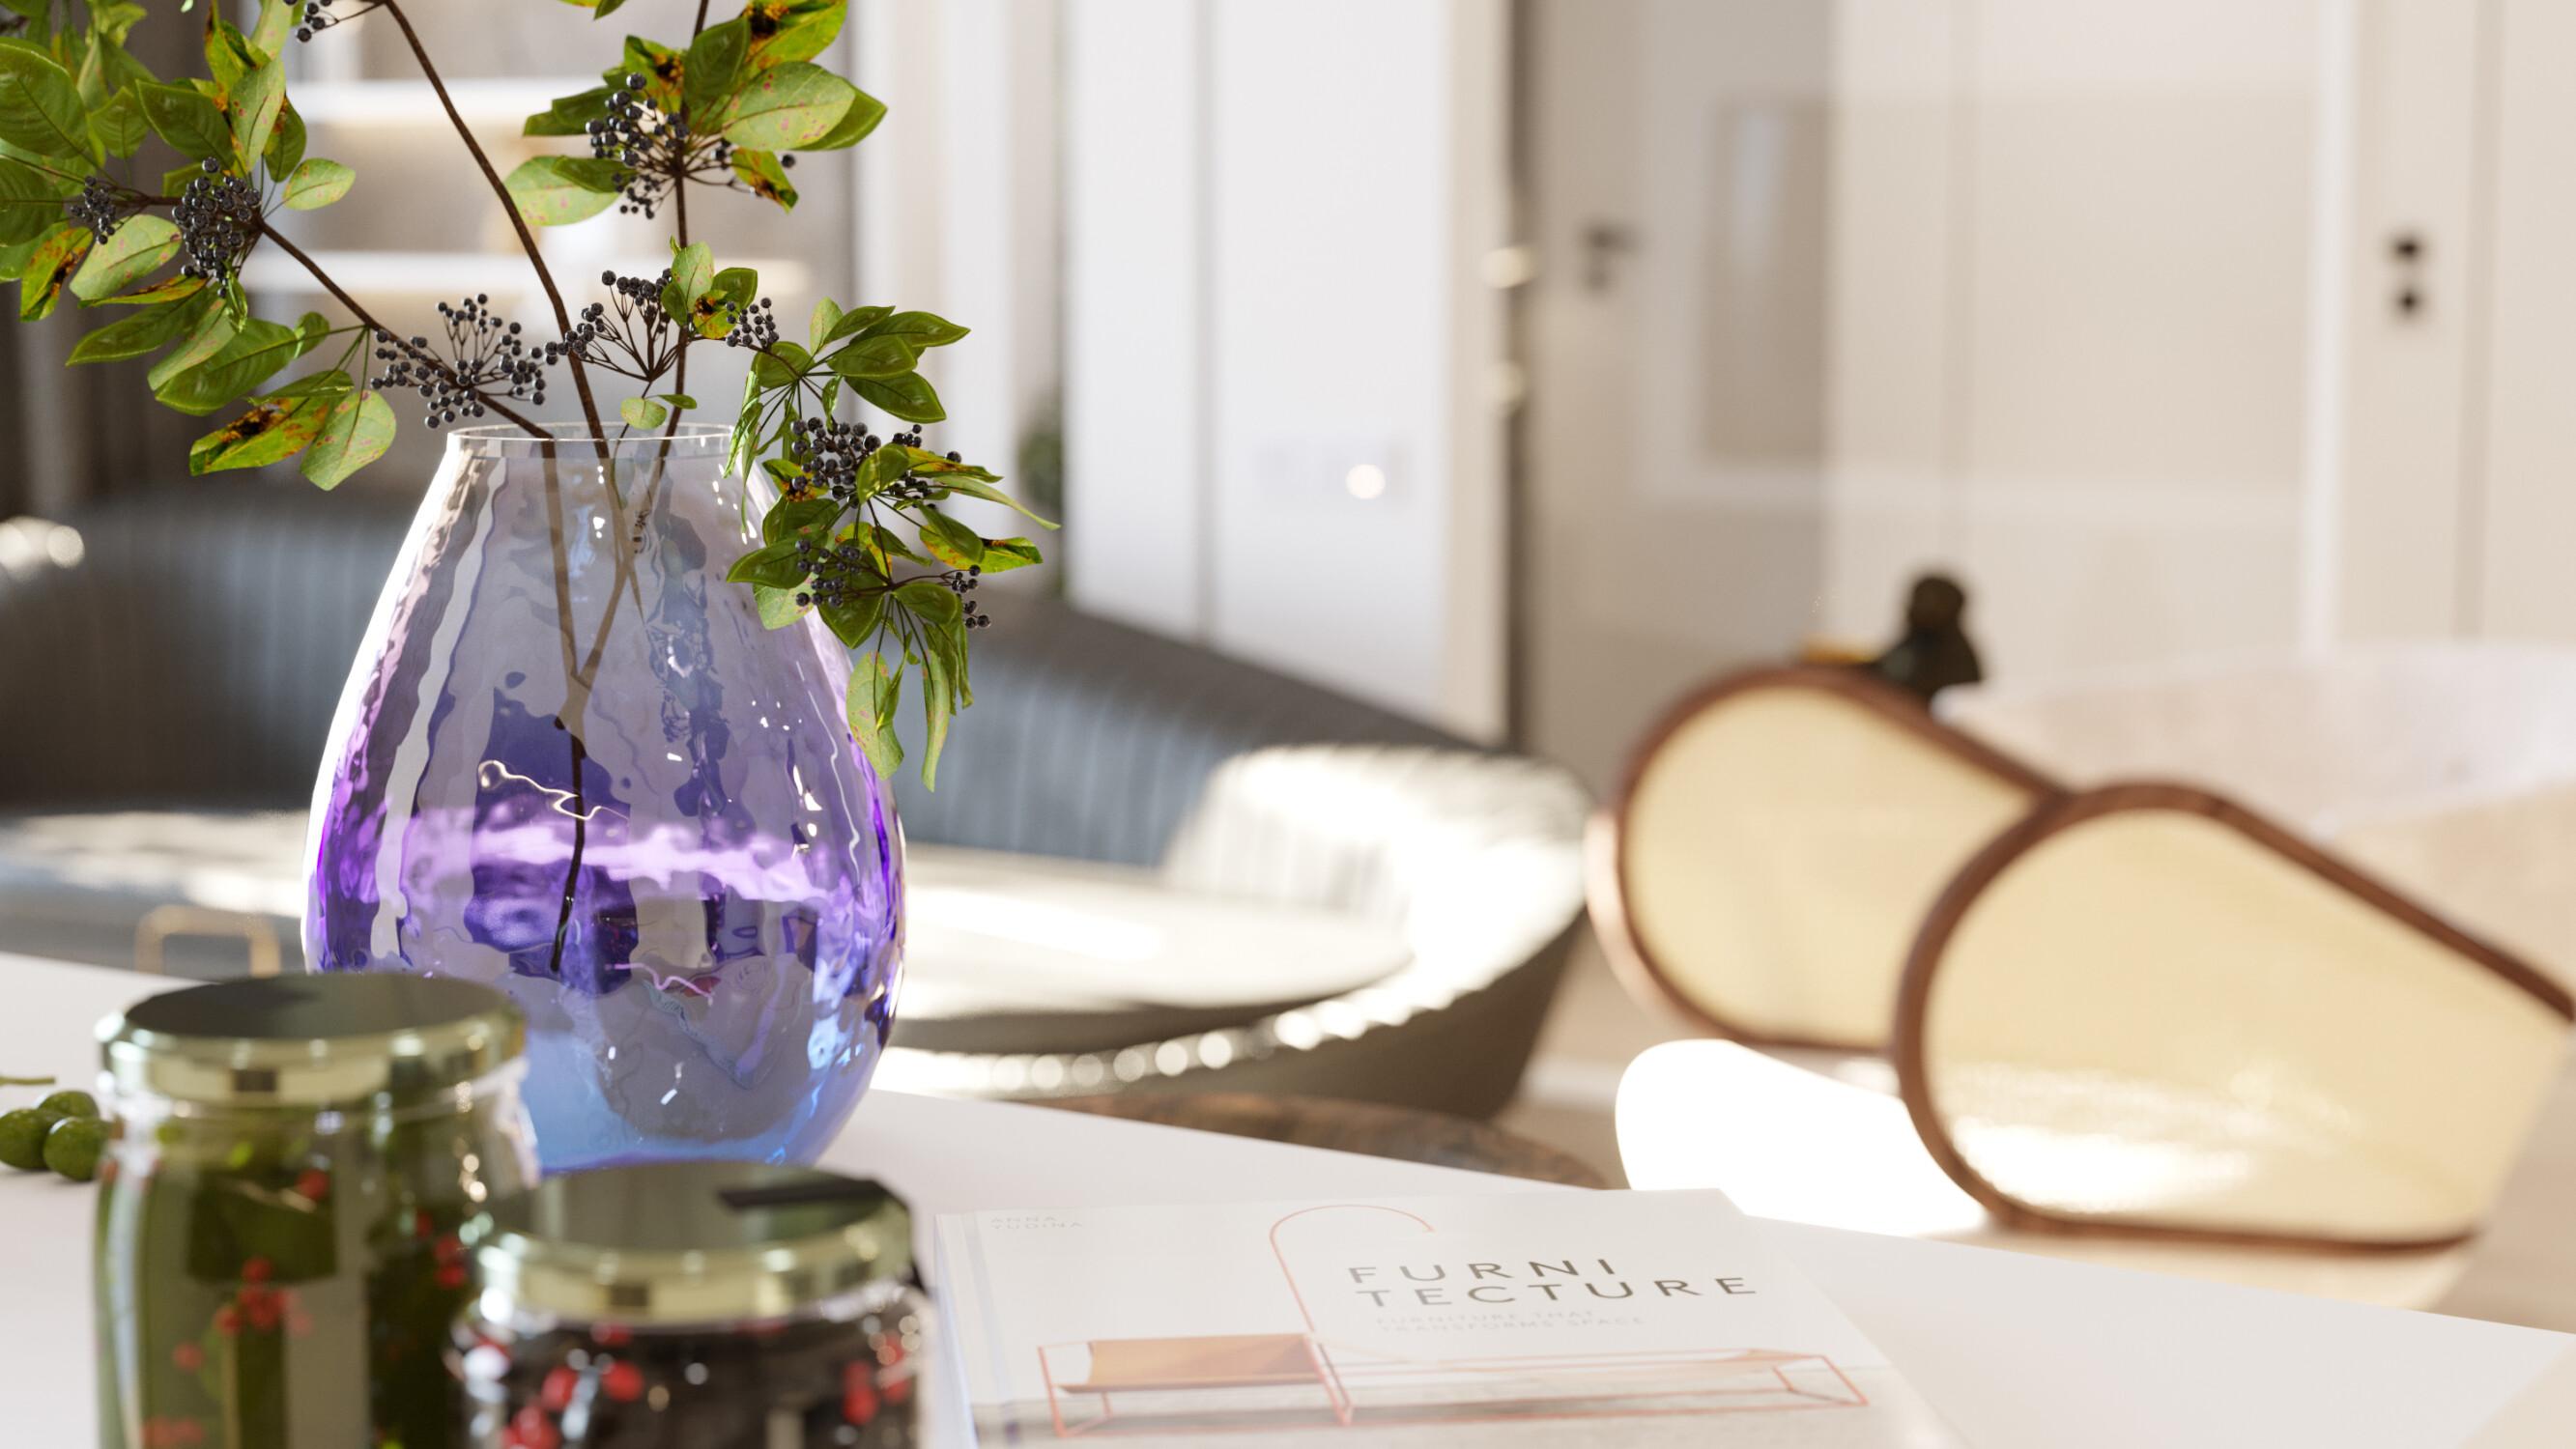 COPENHAGUE-MUDHIF armchair 2 Luxury-Living-Room-ALMA-DE-LUCE